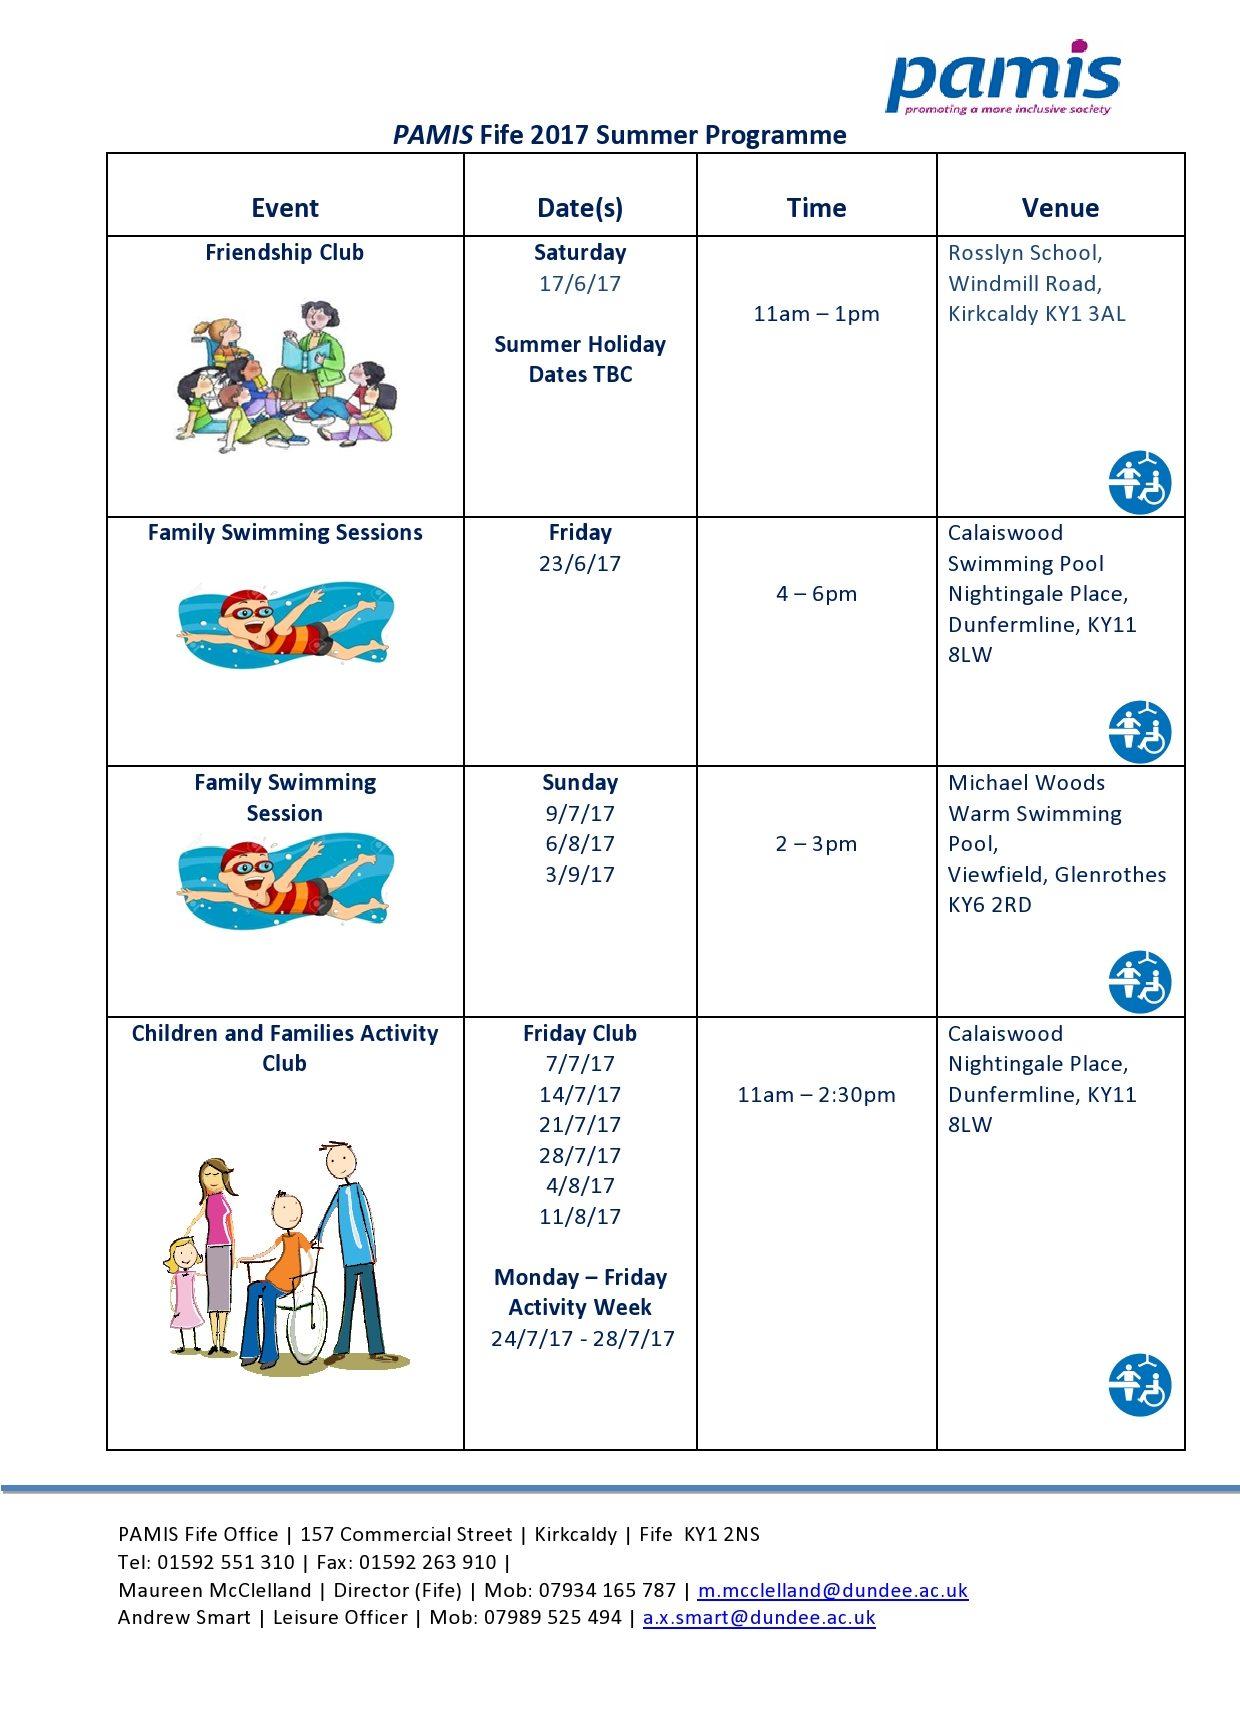 PAMIS Fife Summer activity programme